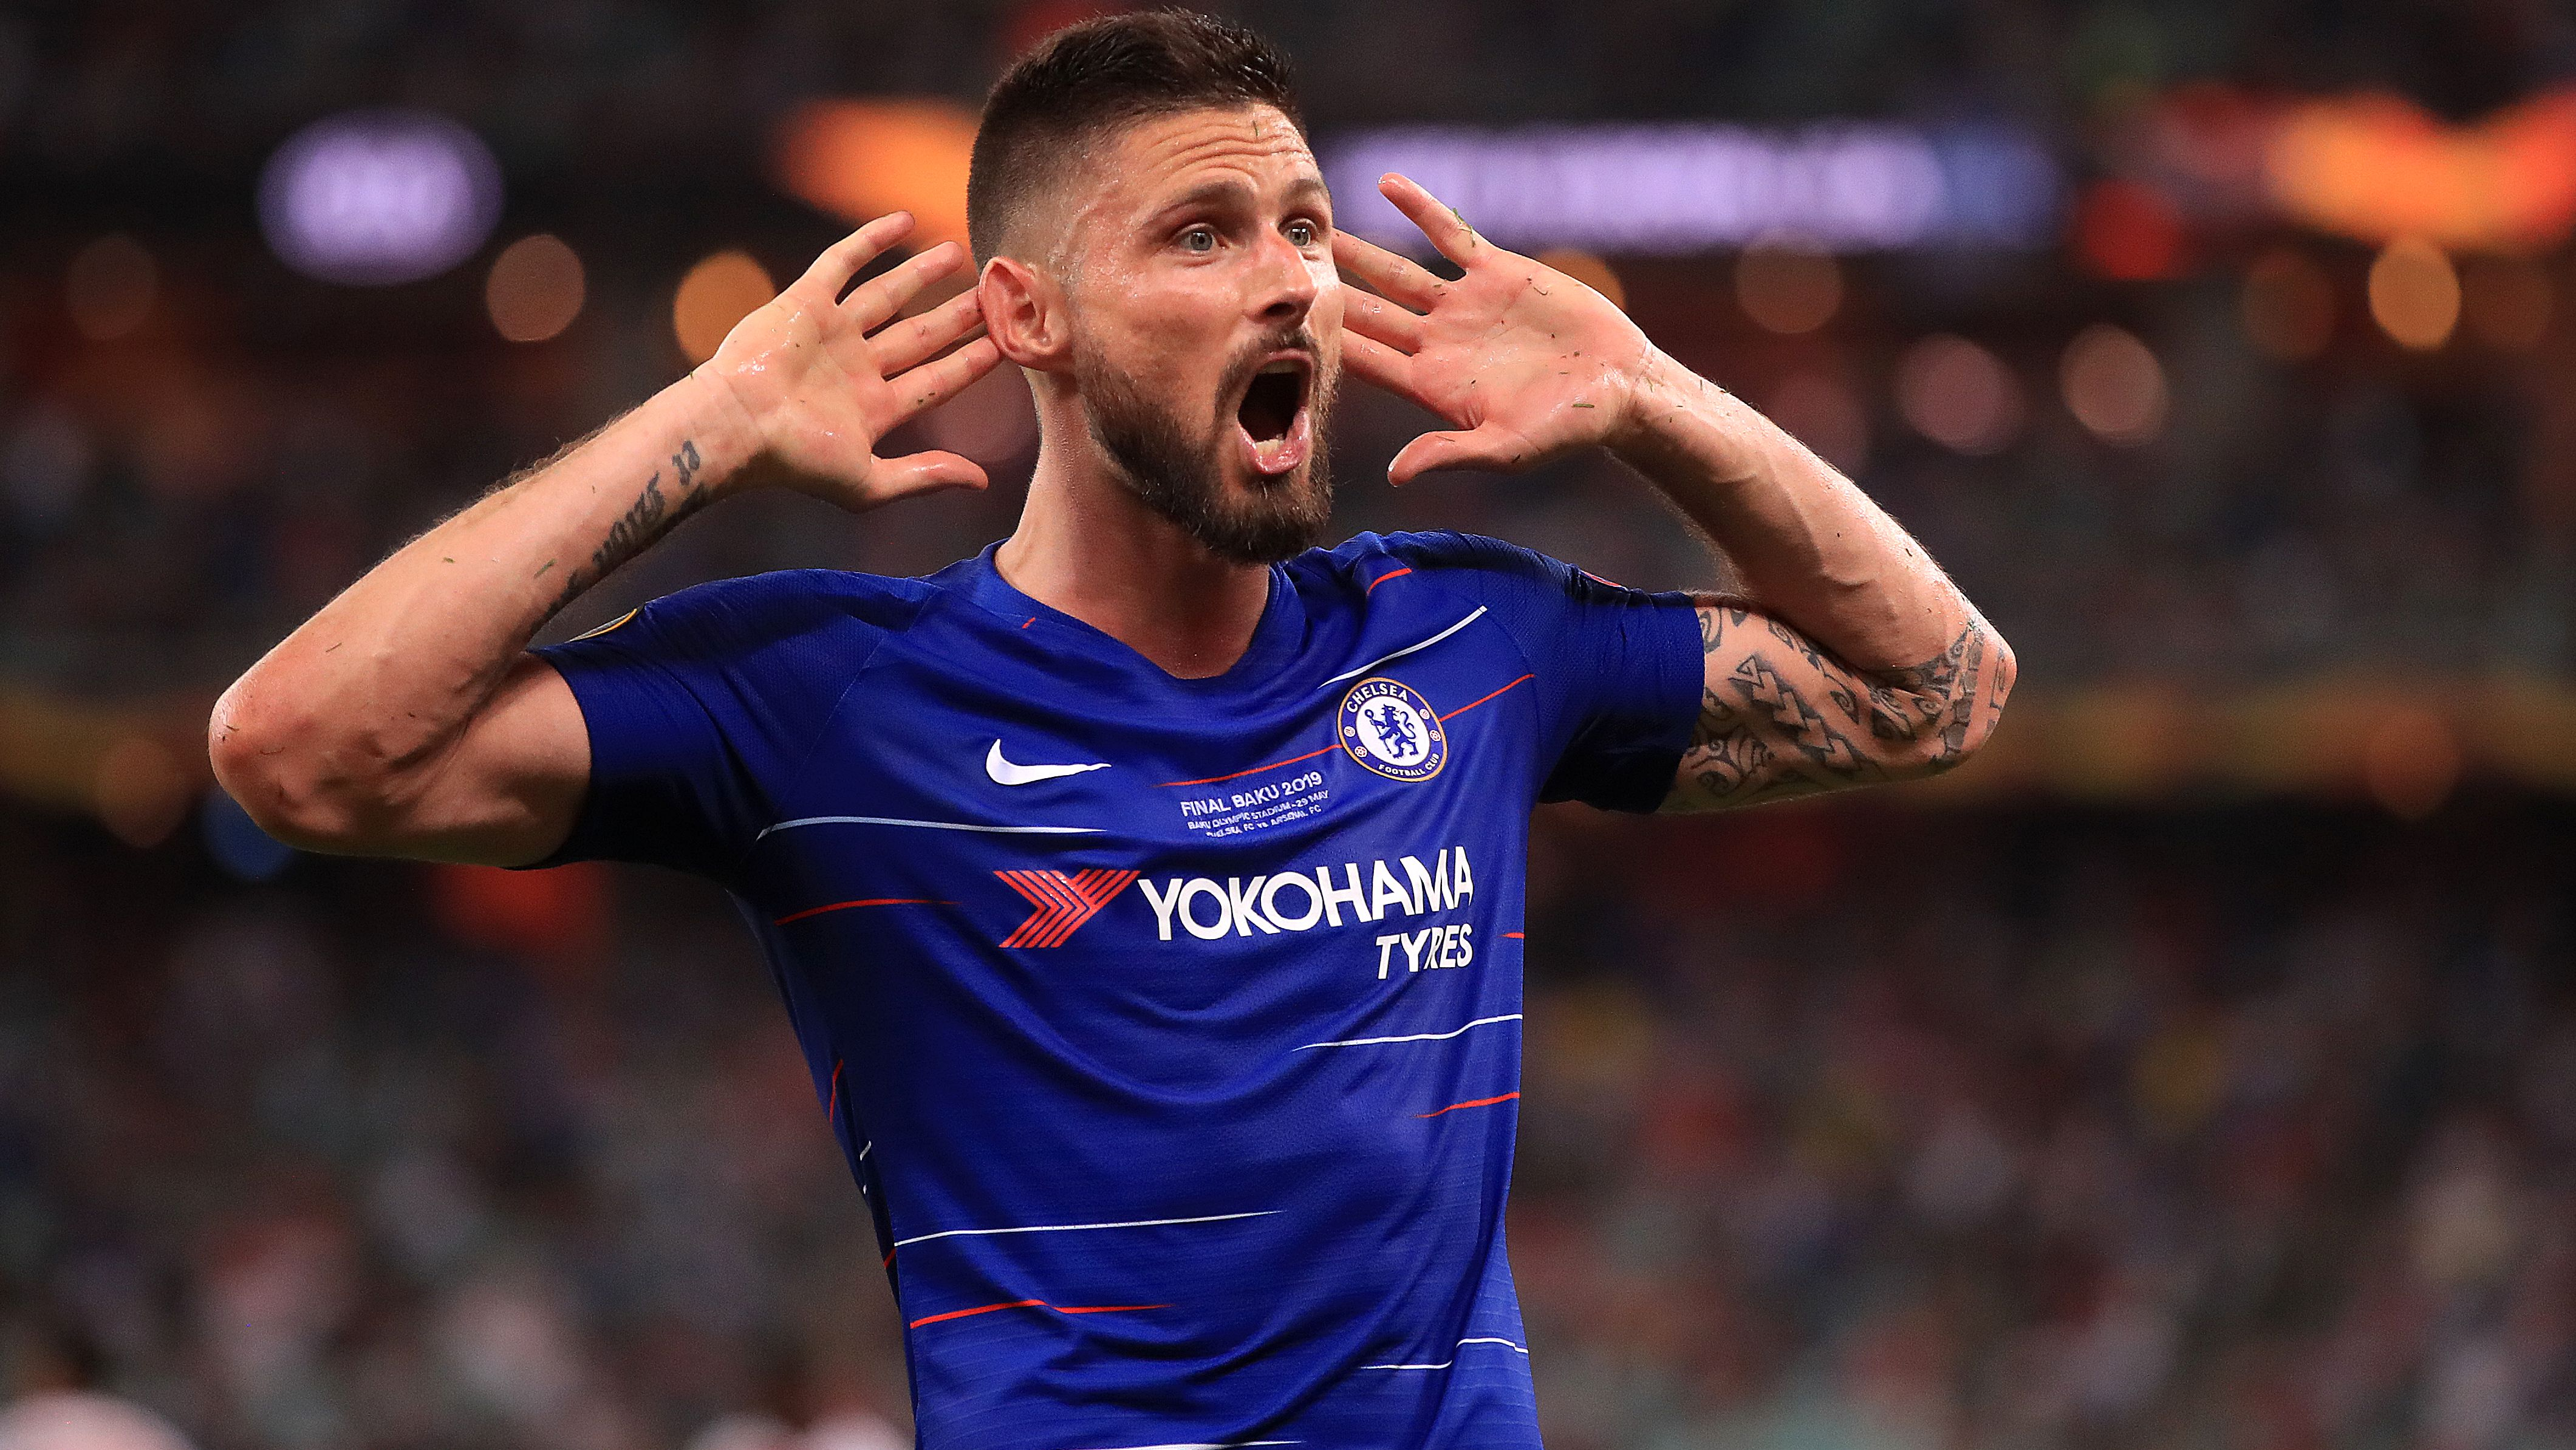 Chelsea's Olivier Giroud beim Jubel im Euro League-Finale in Baku